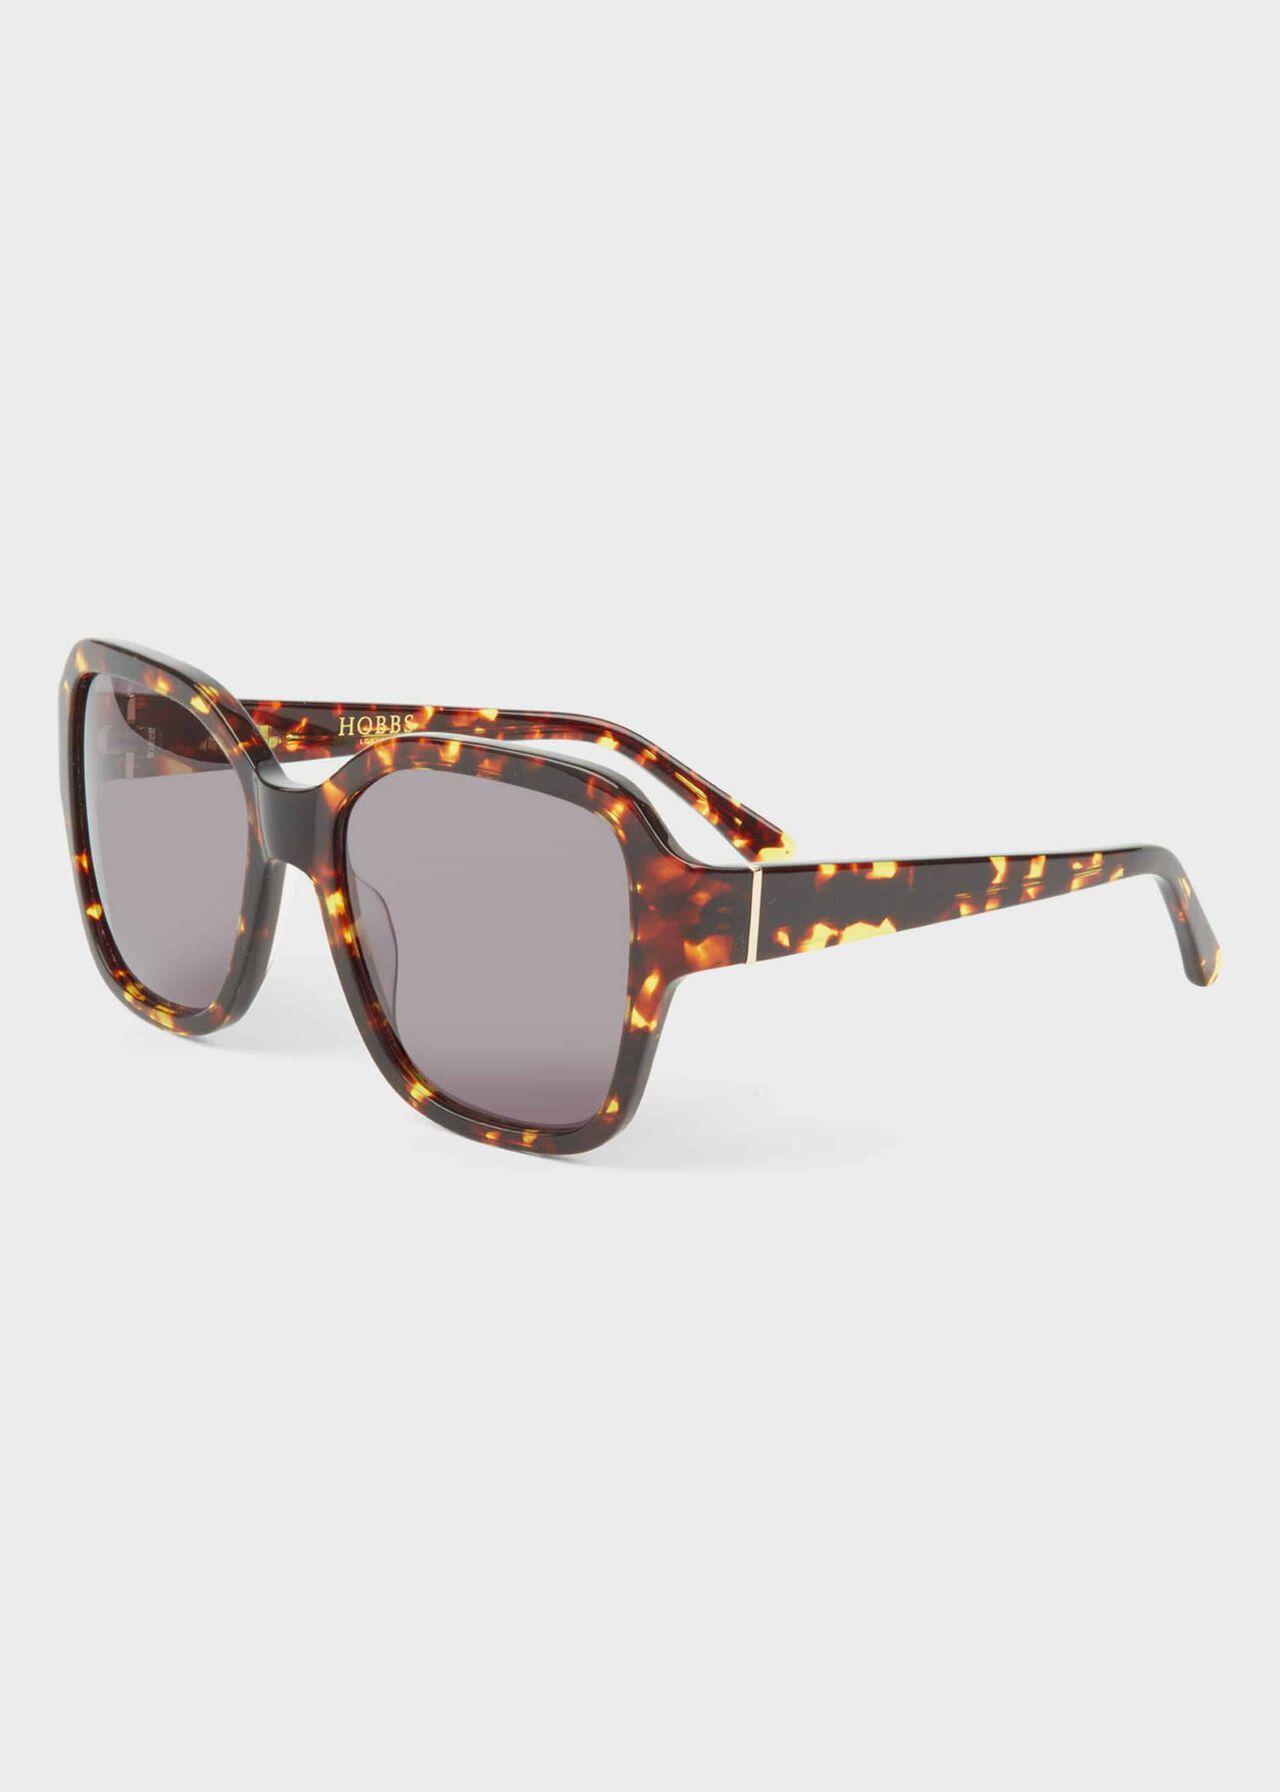 Lyra Tortoiseshell Sunglasses, Tortoiseshell, hi-res